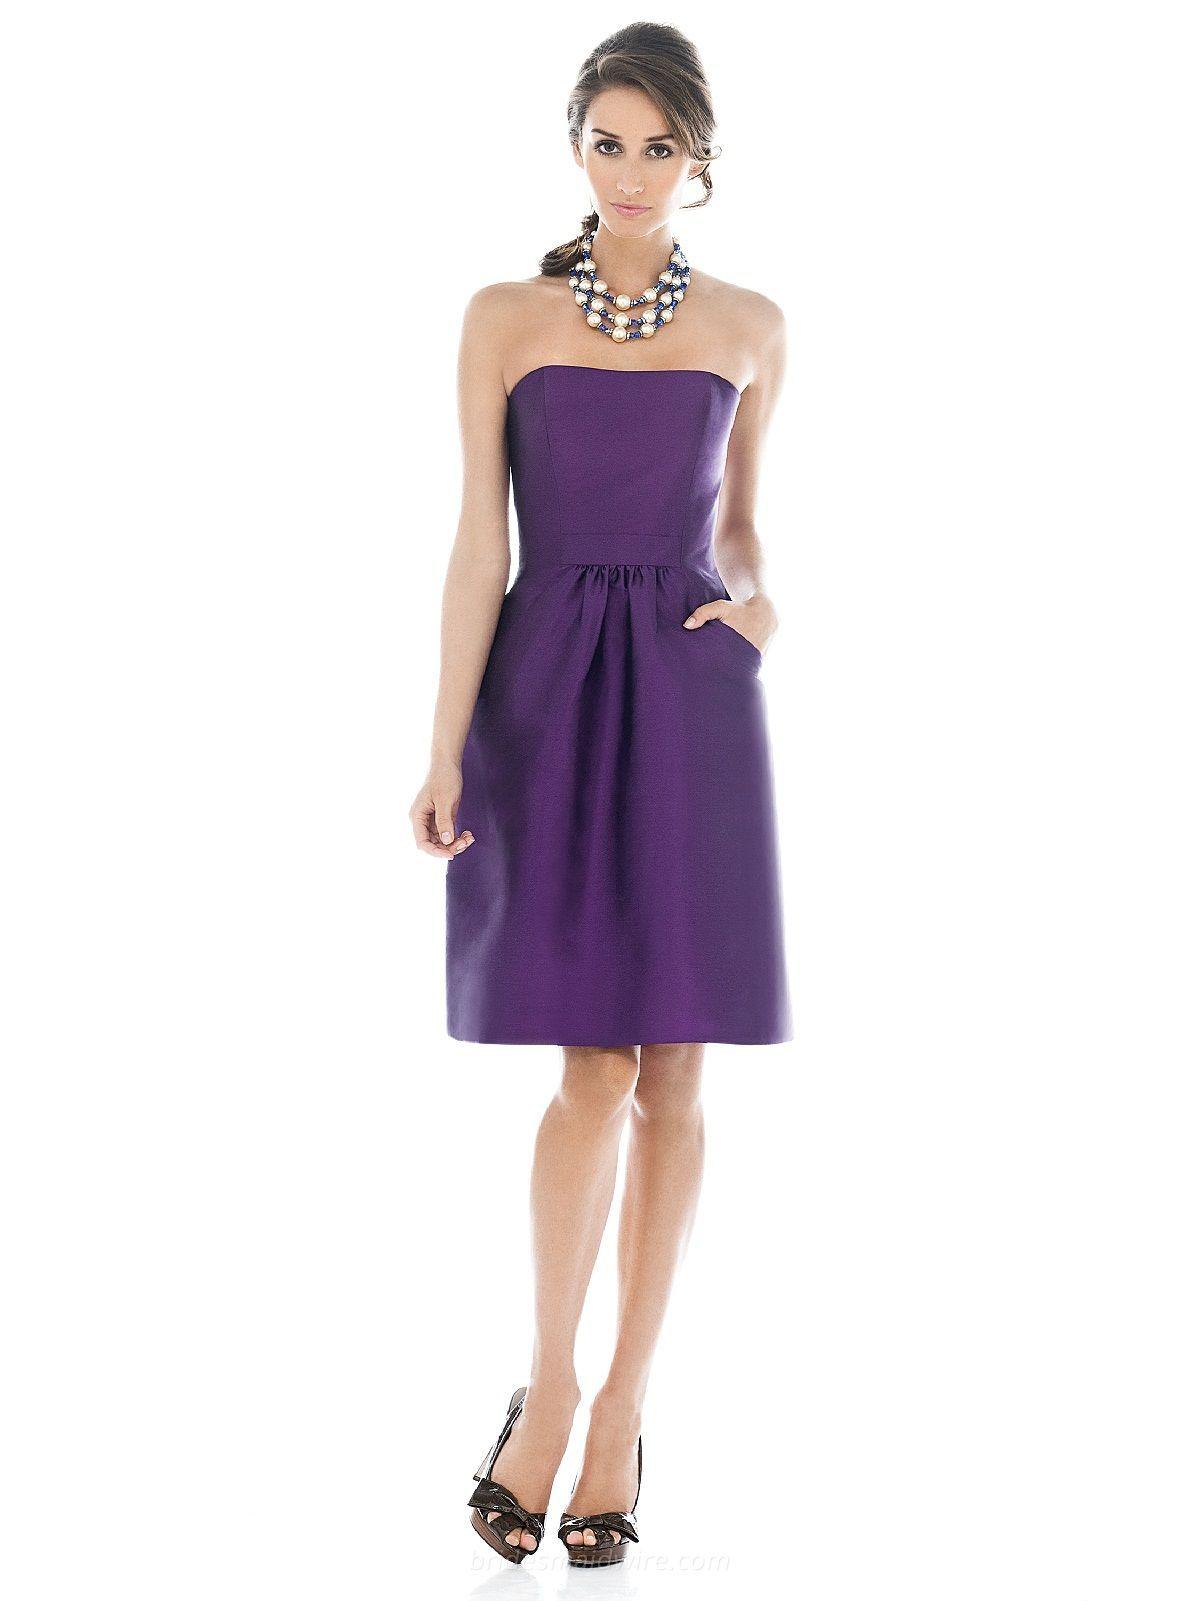 99 purple knee length strapless satin bridesmaid dress 99 purple knee length strapless satin bridesmaid dress purple bridesmaid dresseswedding bridesmaidsalfred sung ombrellifo Choice Image